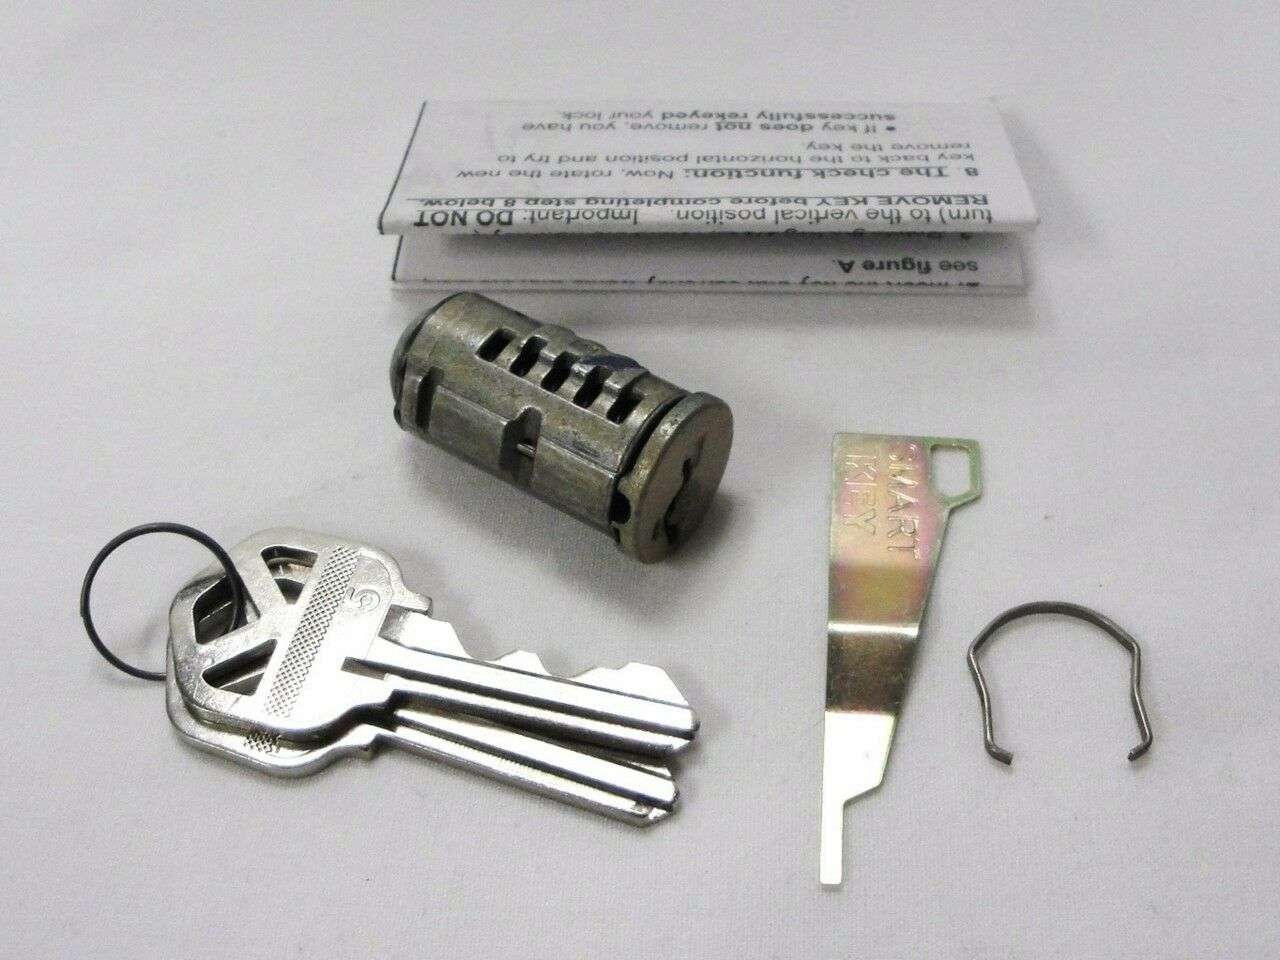 Kwikset SmartKey Replacement Cylinder Knob Rekey | eBay